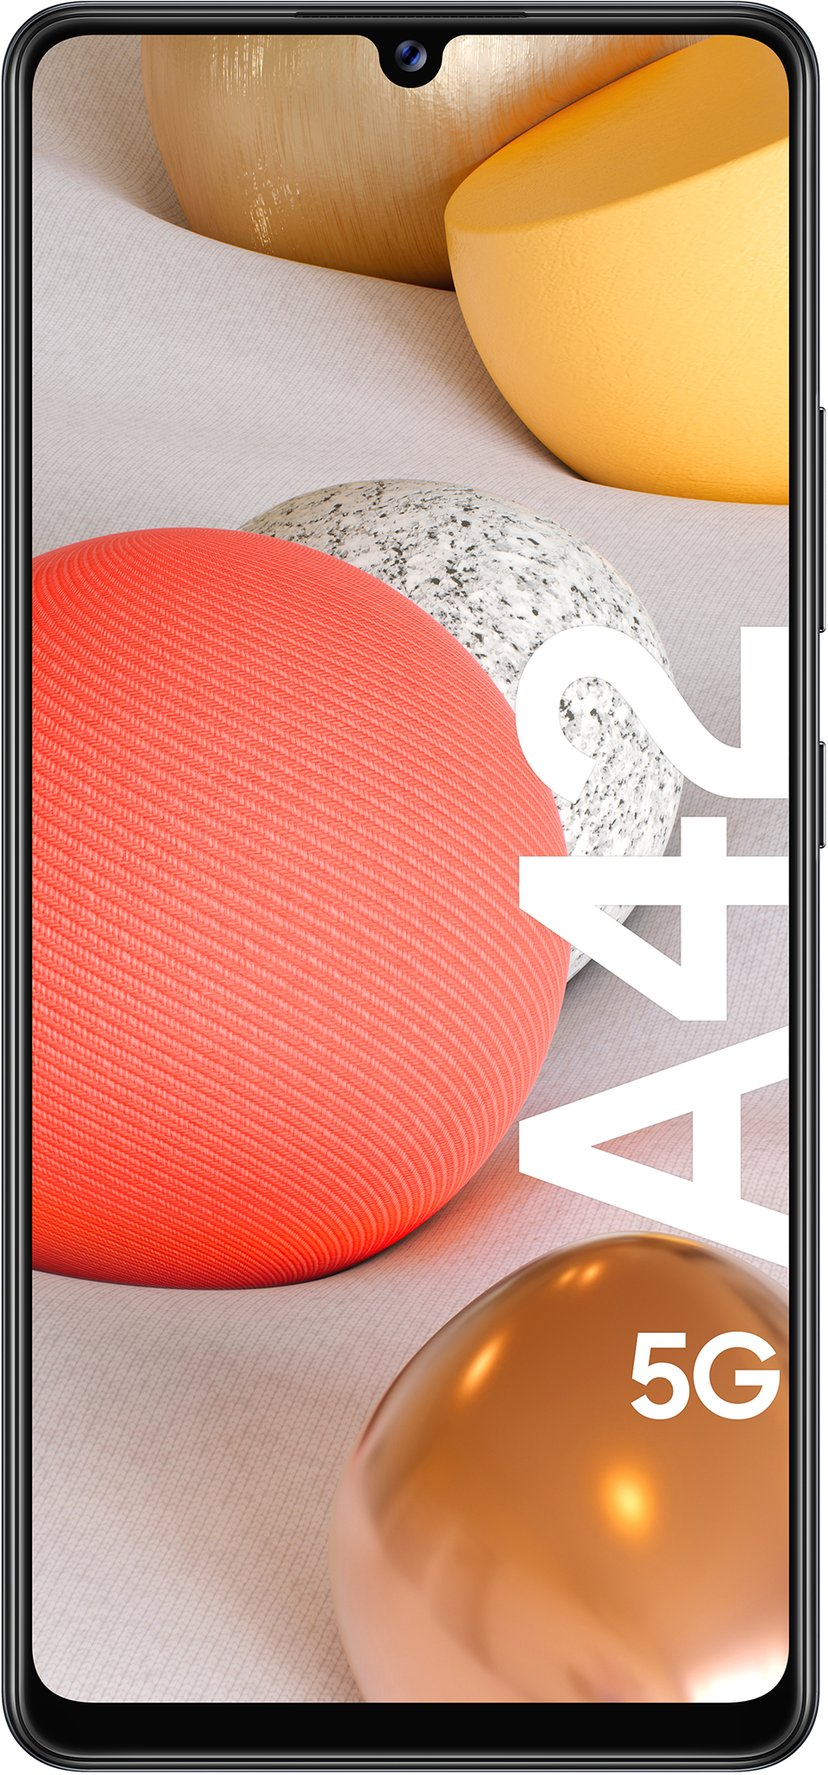 Samsung Galaxy A42 5G 128GB Dobbelt-SIM Prismeprikksvart